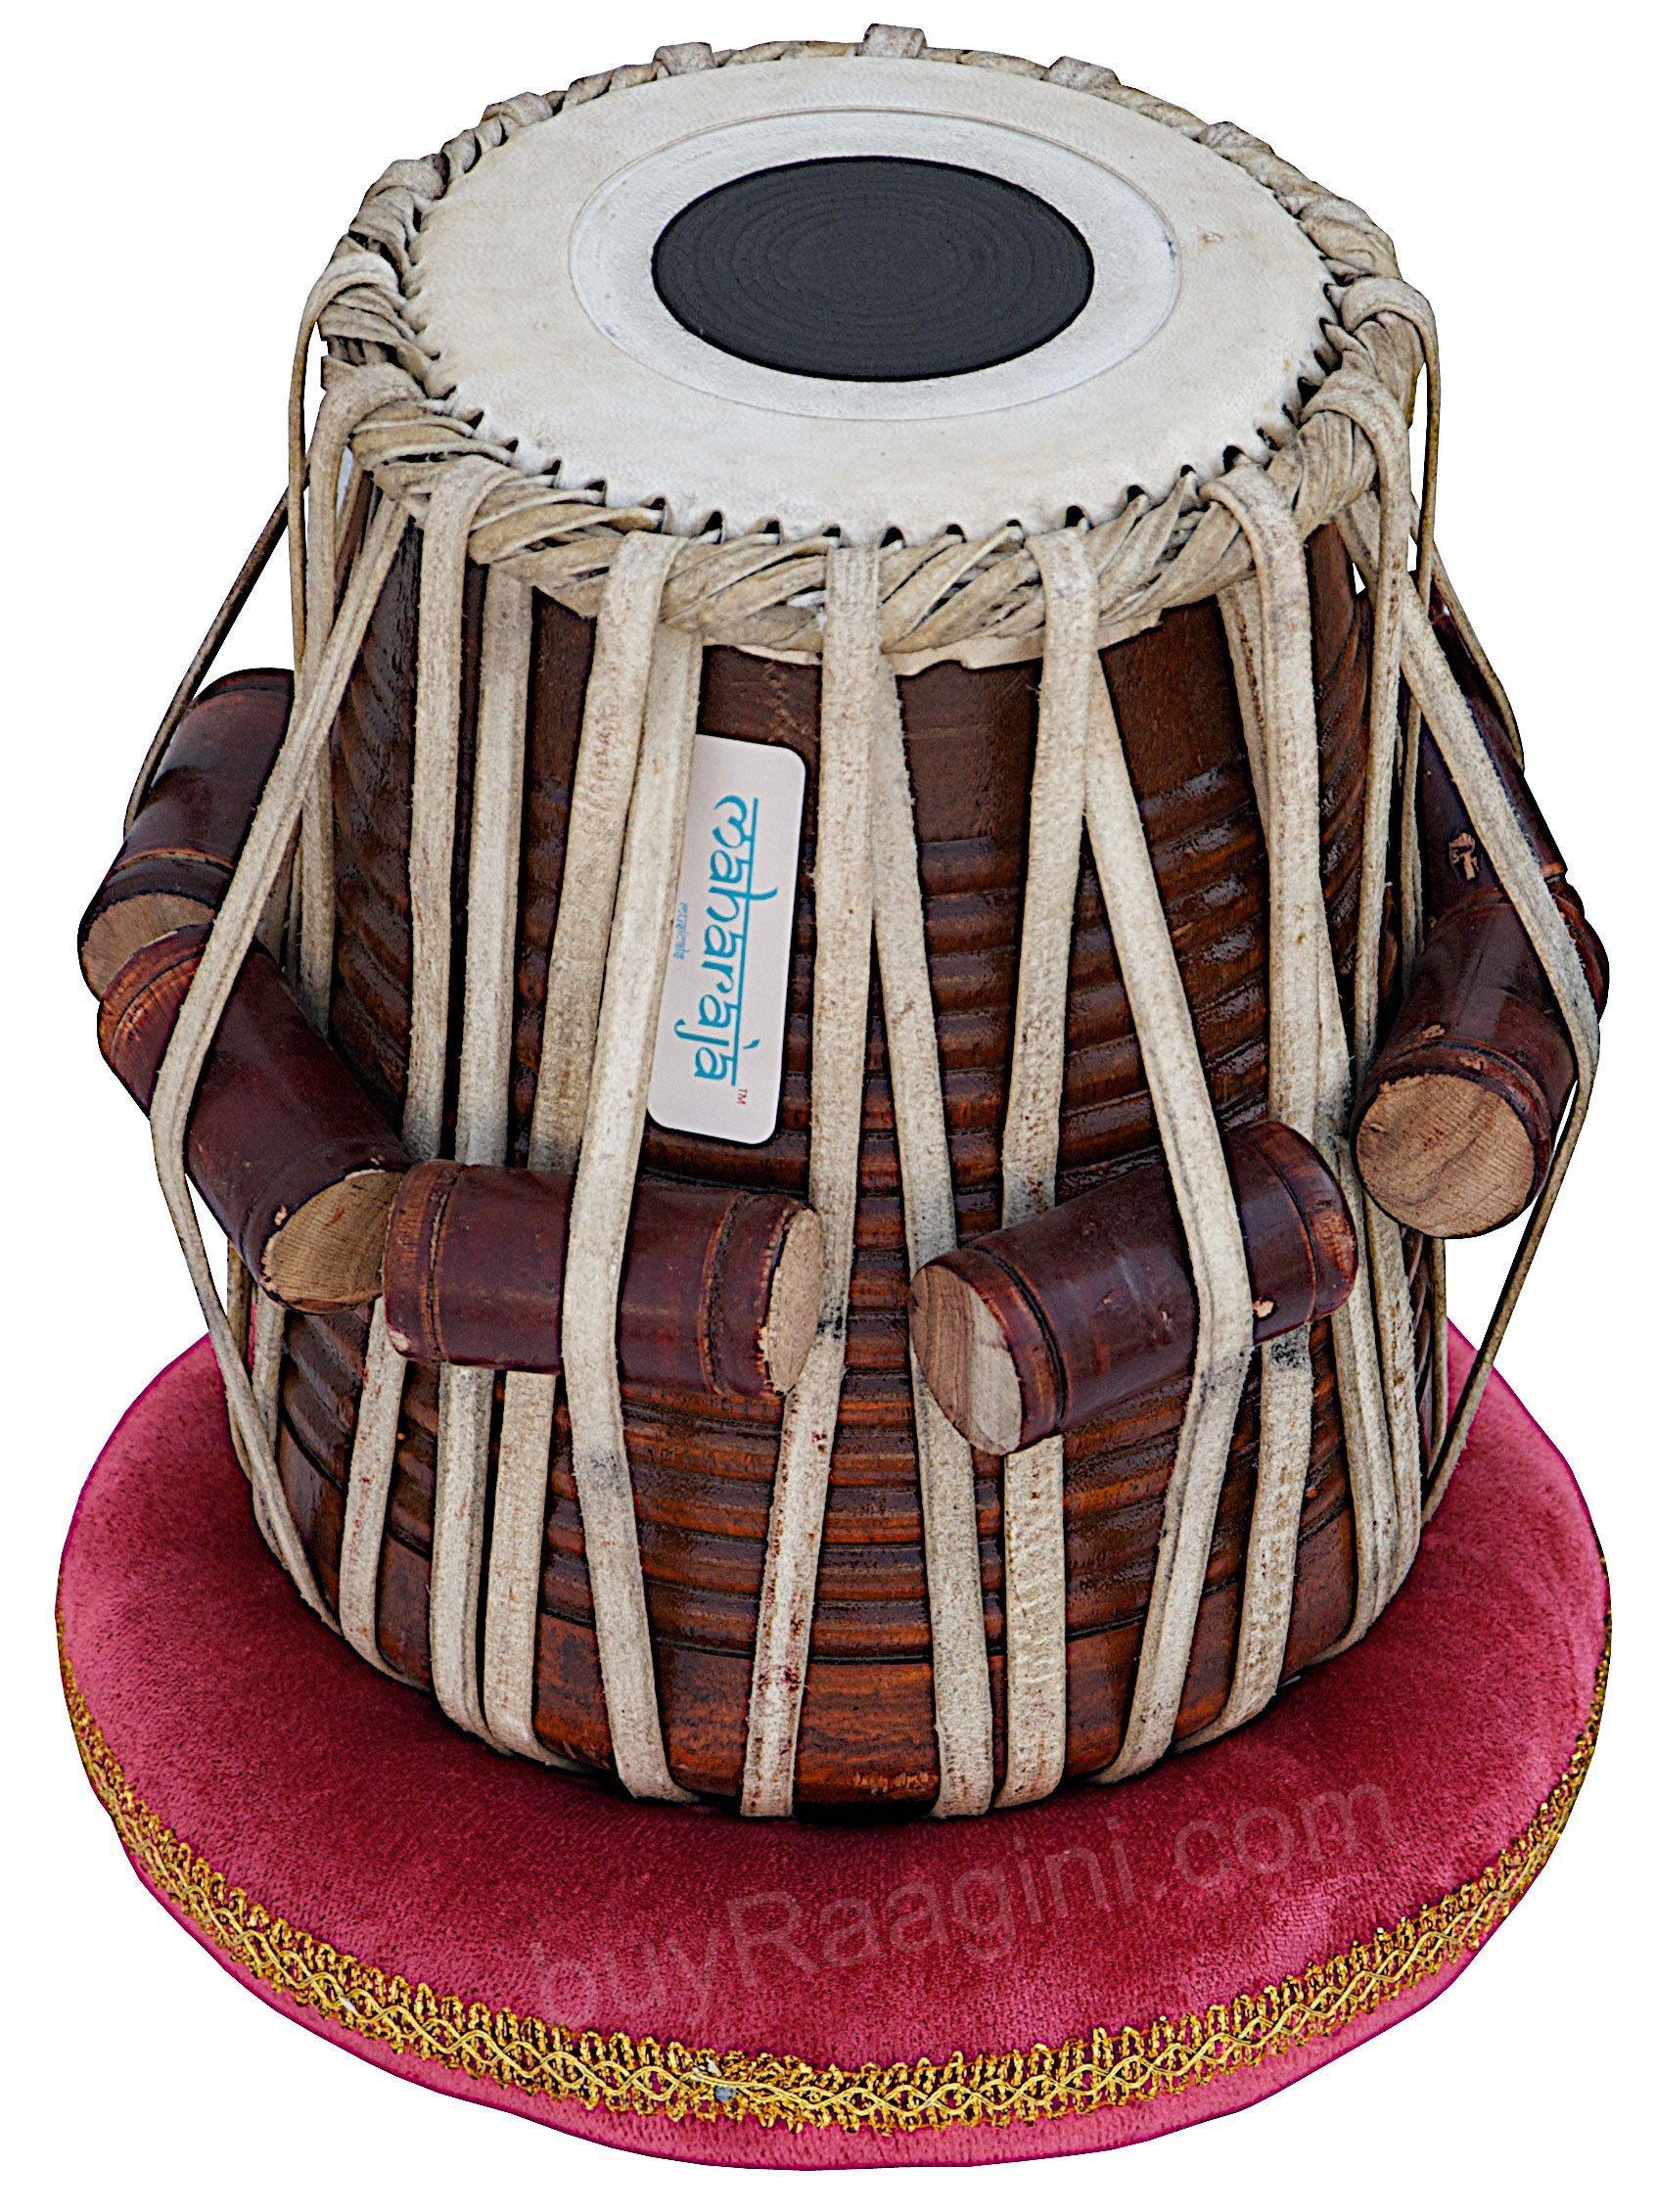 Tabla Set by Maharaja Musicals, Golden Brass Bayan 3Kg, Sheesham Dayan Tabla, Nylon Bag, Hammer, Book, Cushions, Cover, Tabla Indian Drums (PDI-CH) by Maharaja Musicals (Image #5)